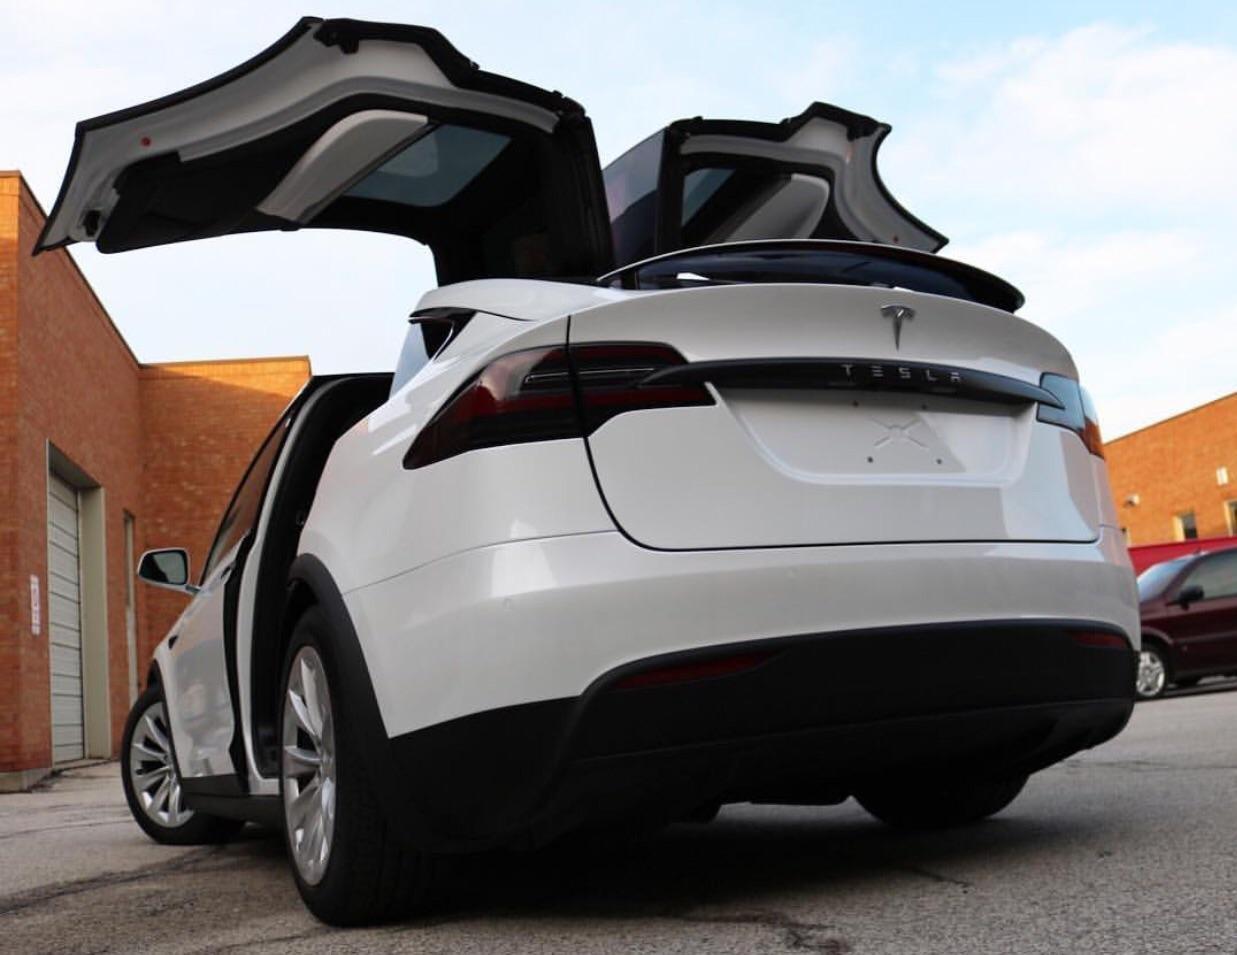 Tesla Model X Smoked Tail Light Overlays Protective Film Covers Kit